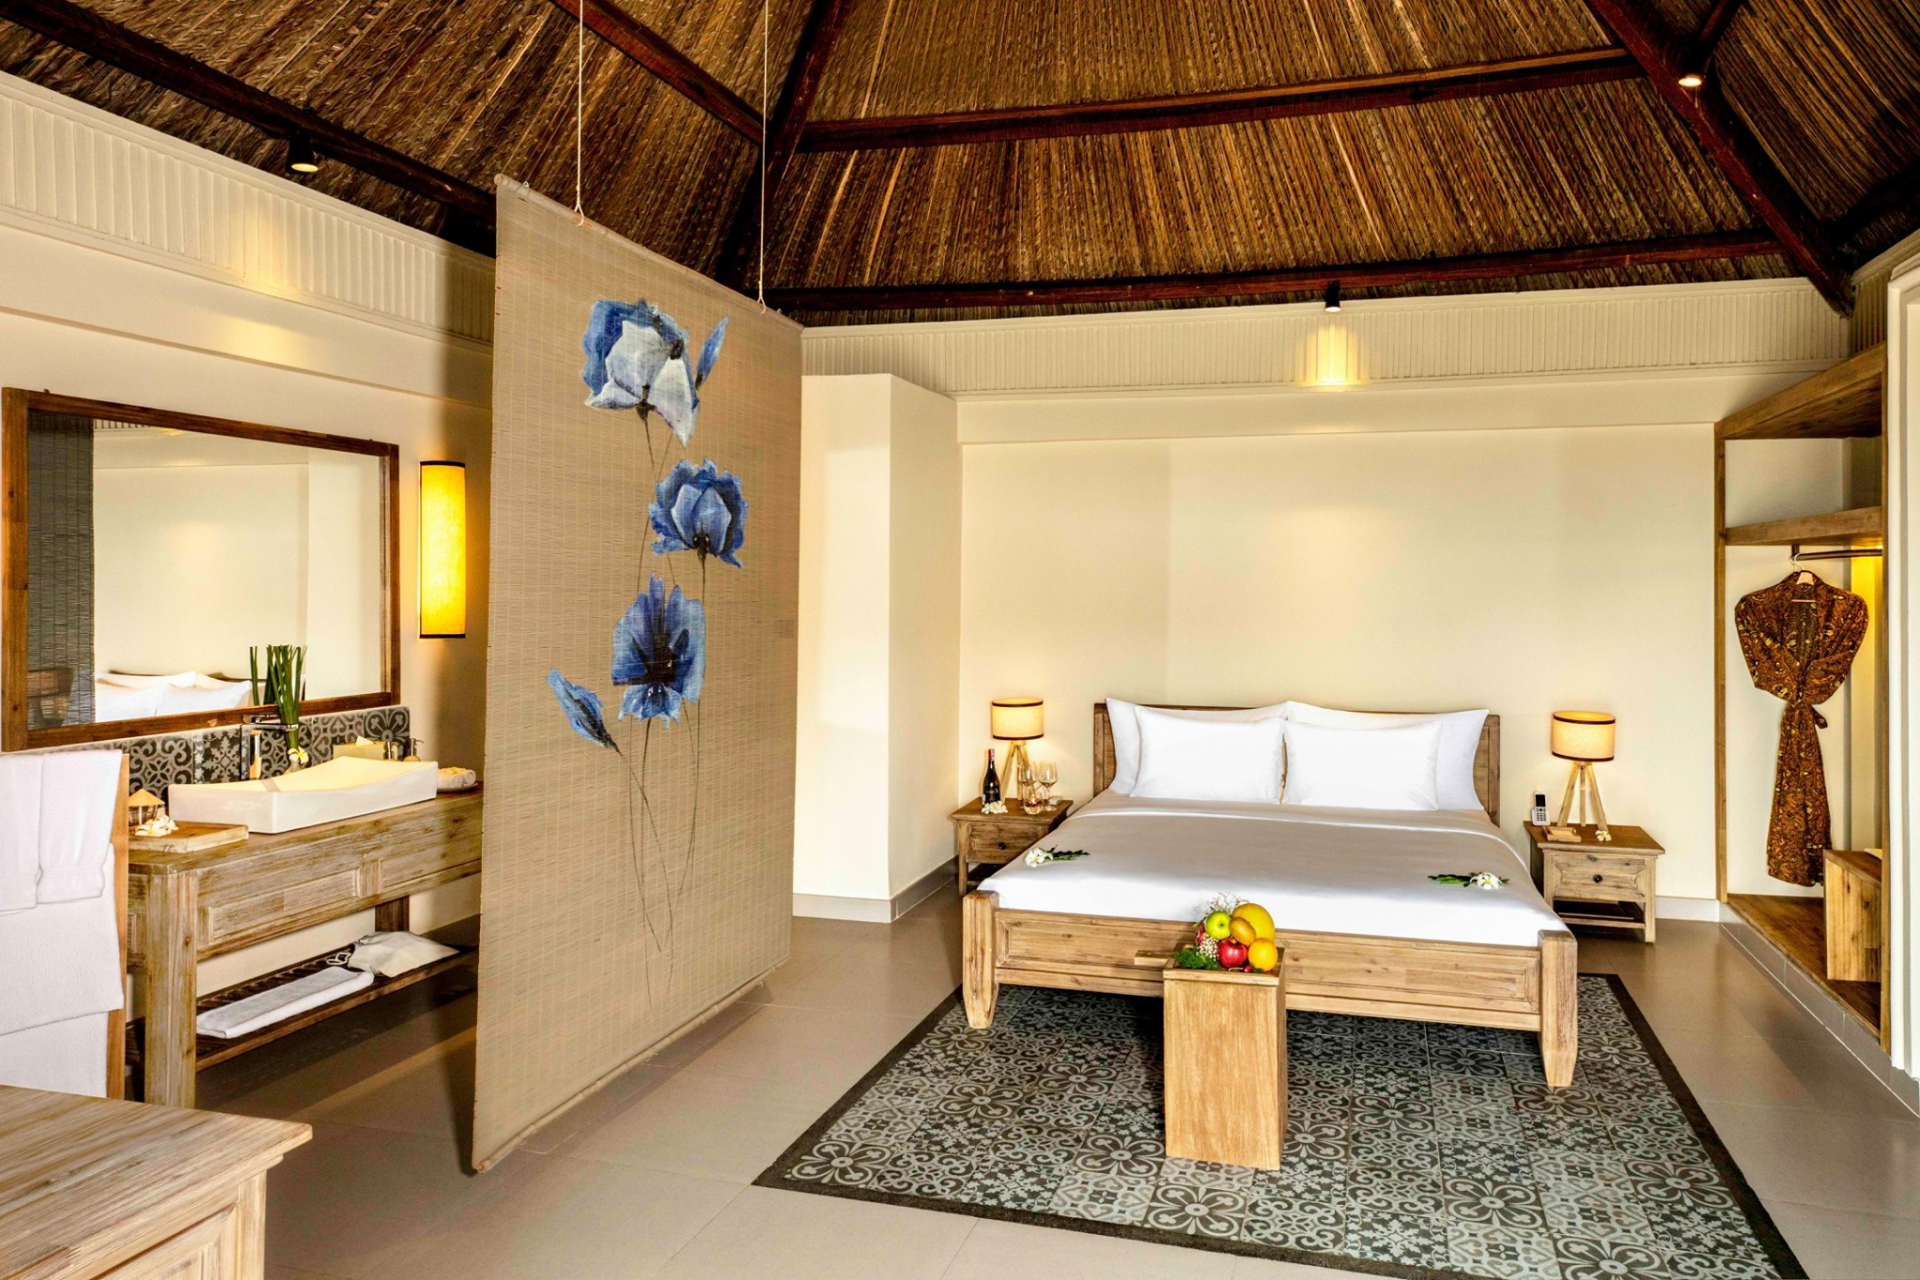 Top 4 Seaside Resorts in Quy Nhon, Vietnam